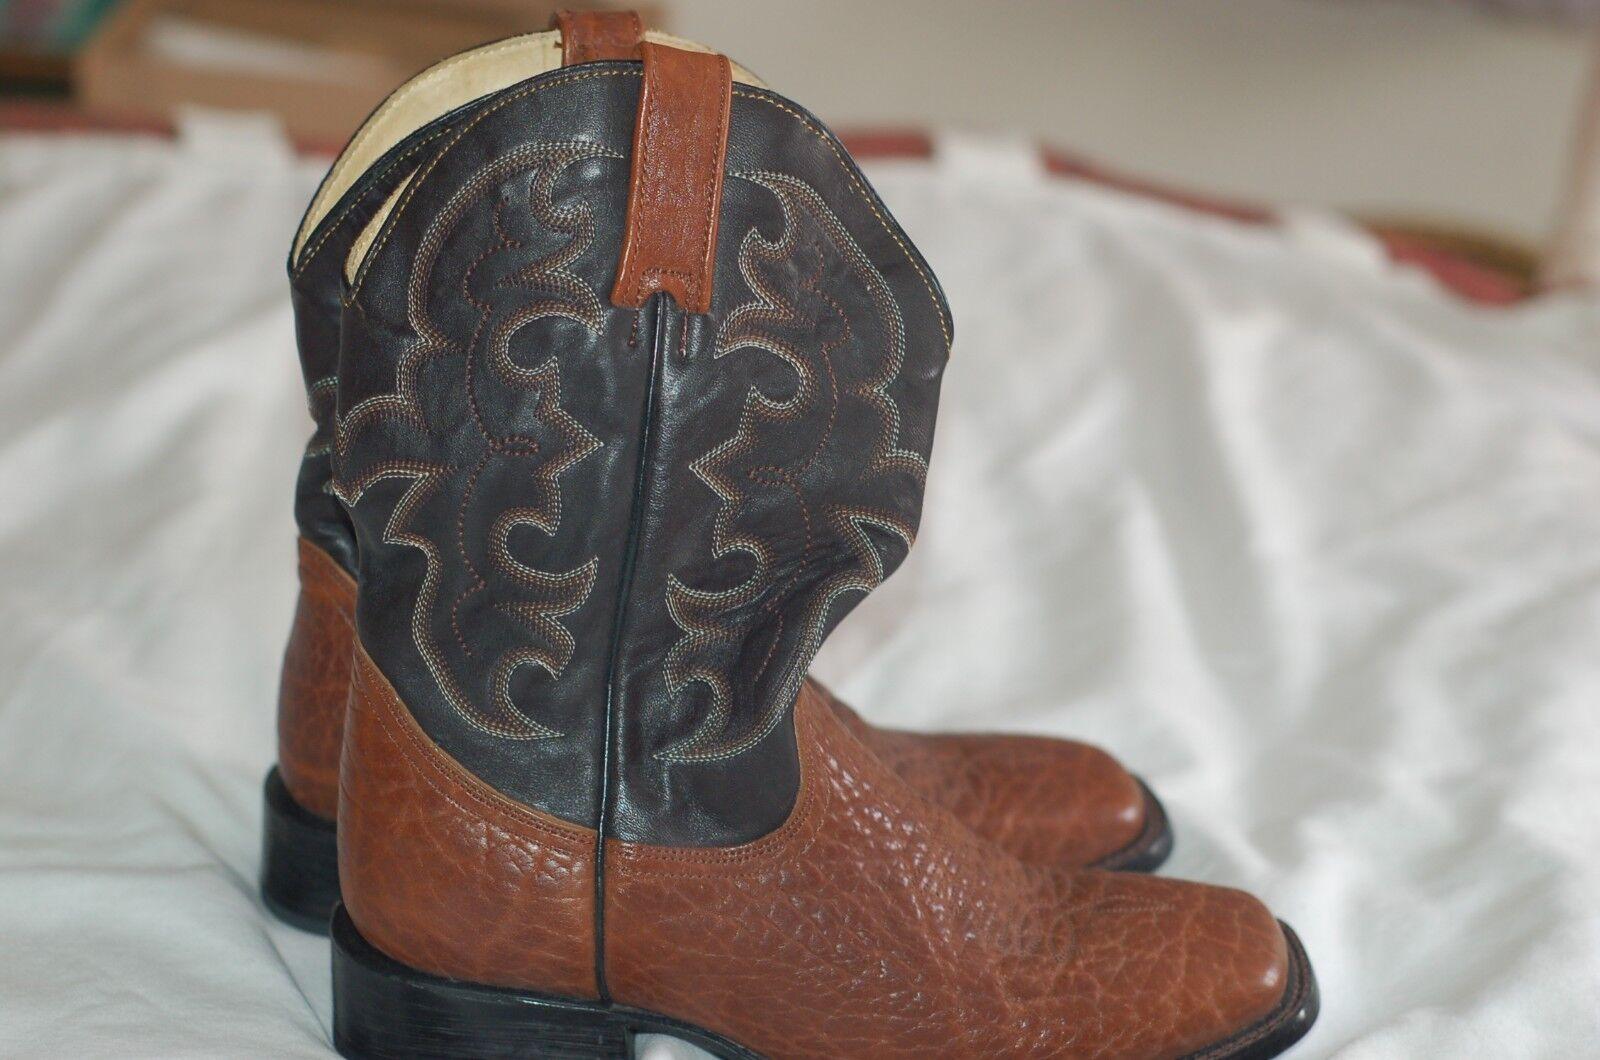 Bar Iii 7575 Men's Shep Boots Plain Toe Wool Lined Boots Shep Size 10.5M c39e75